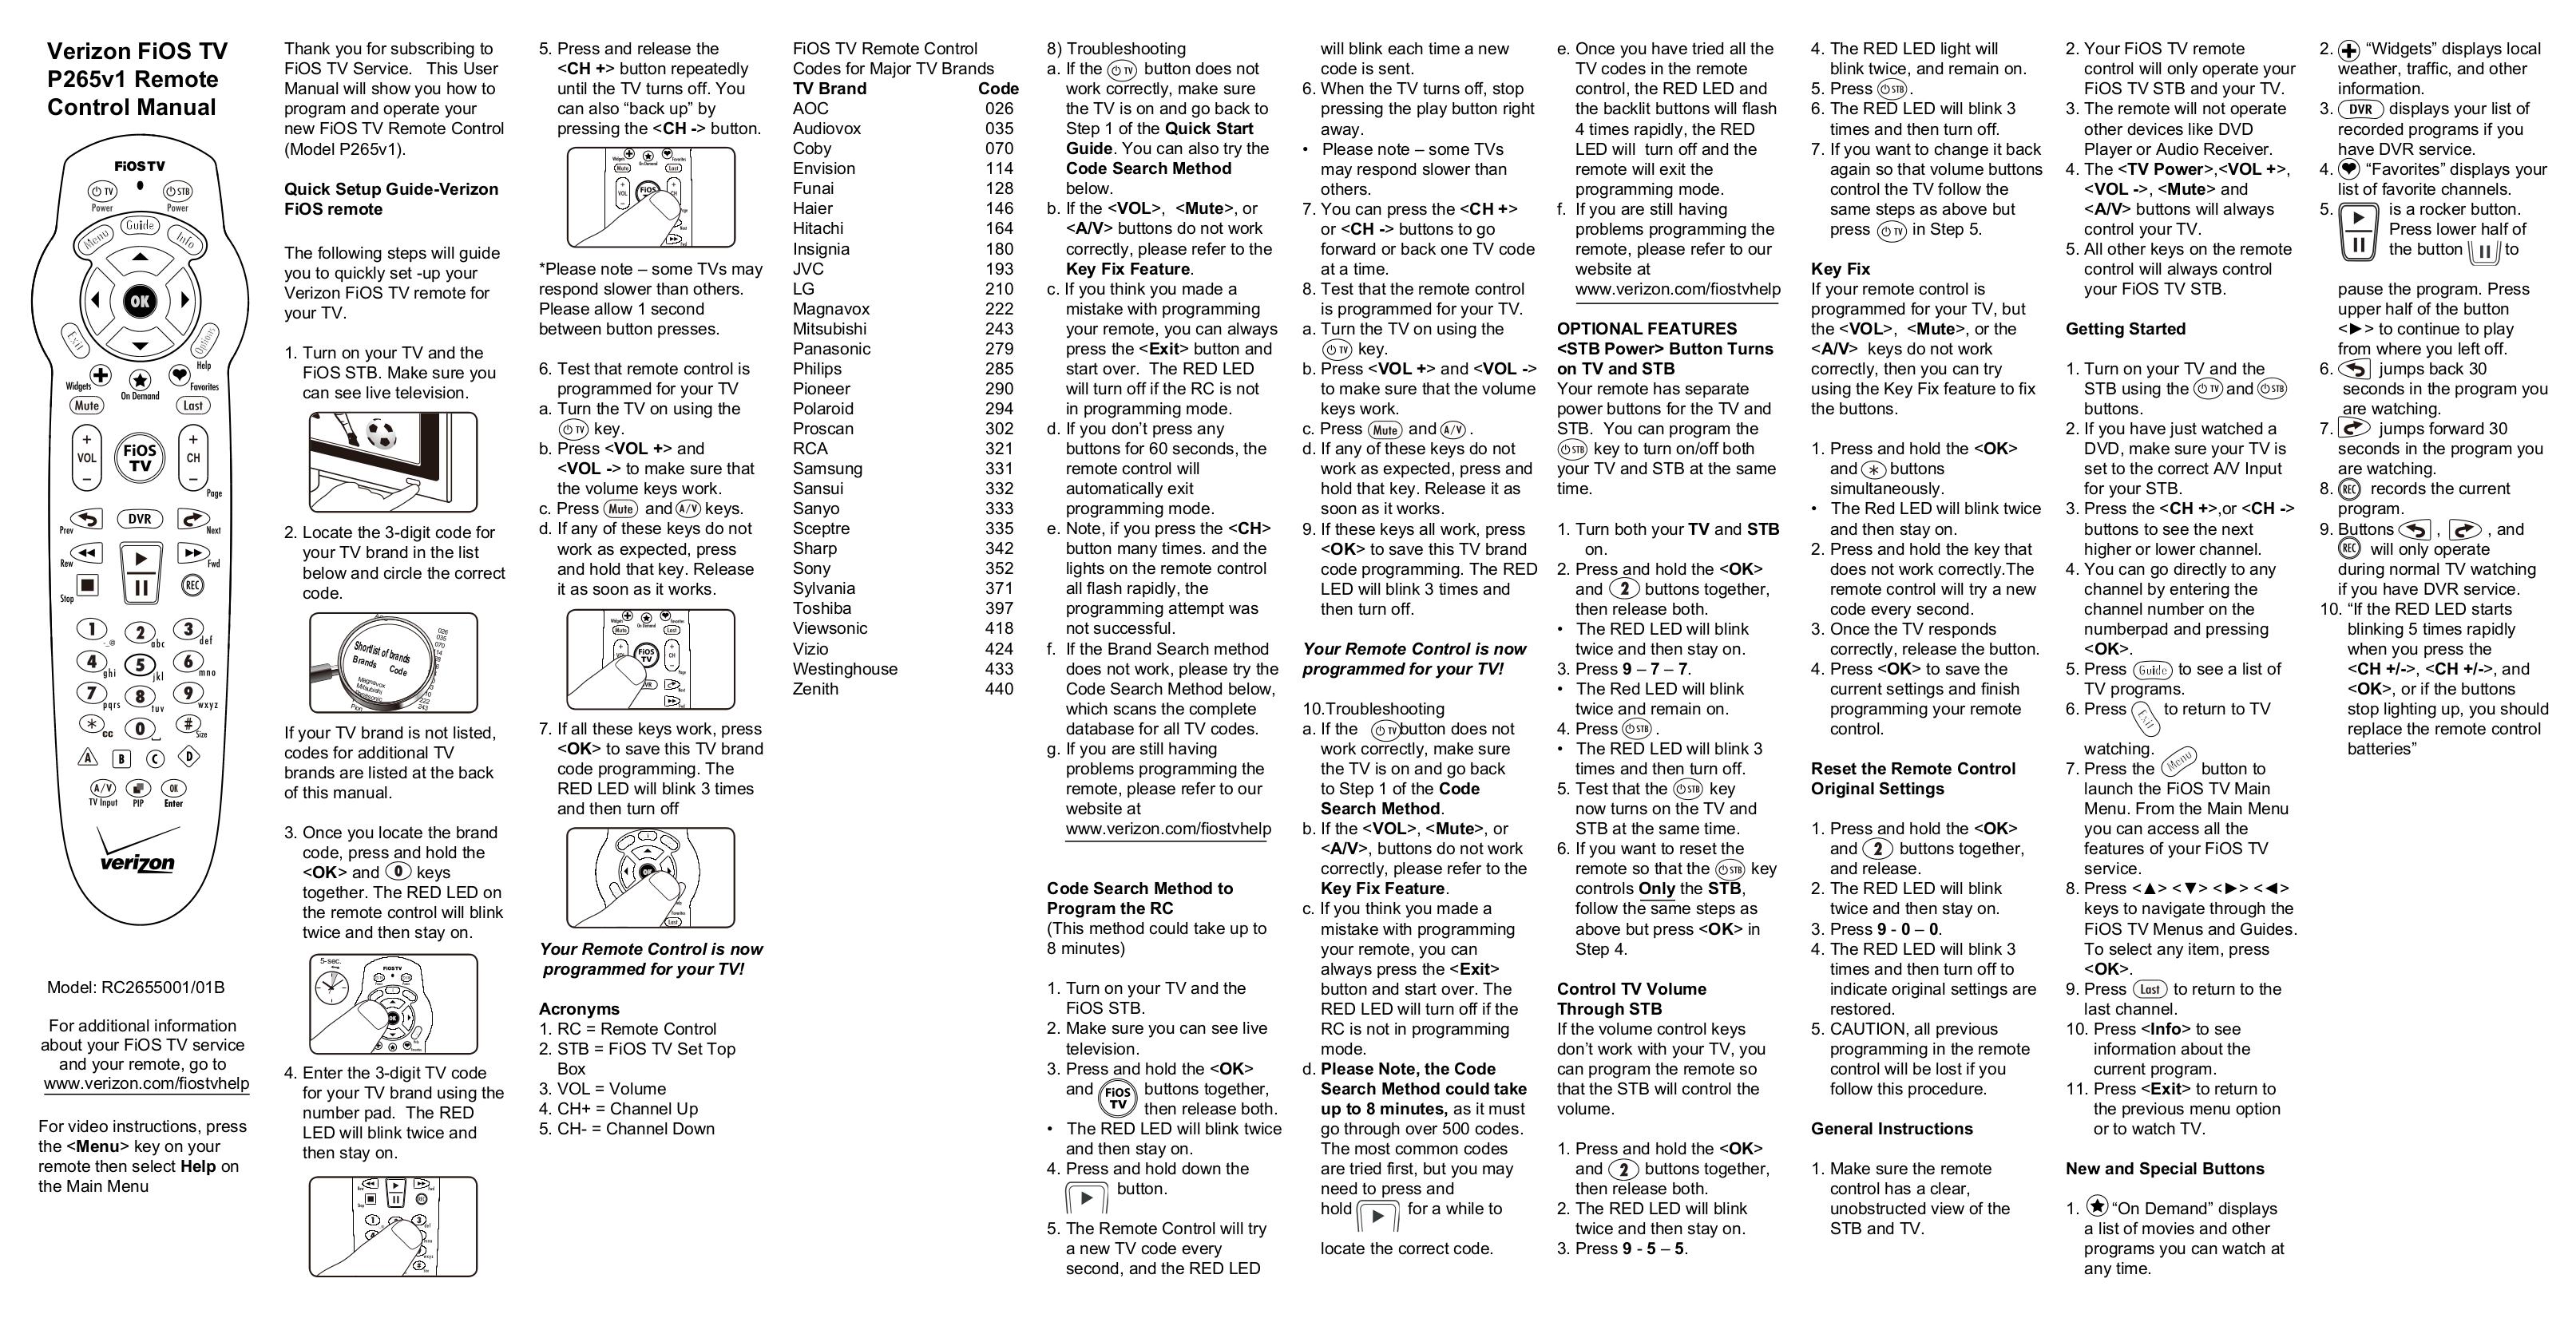 Download free pdf for Zenith DVT216 TV manual